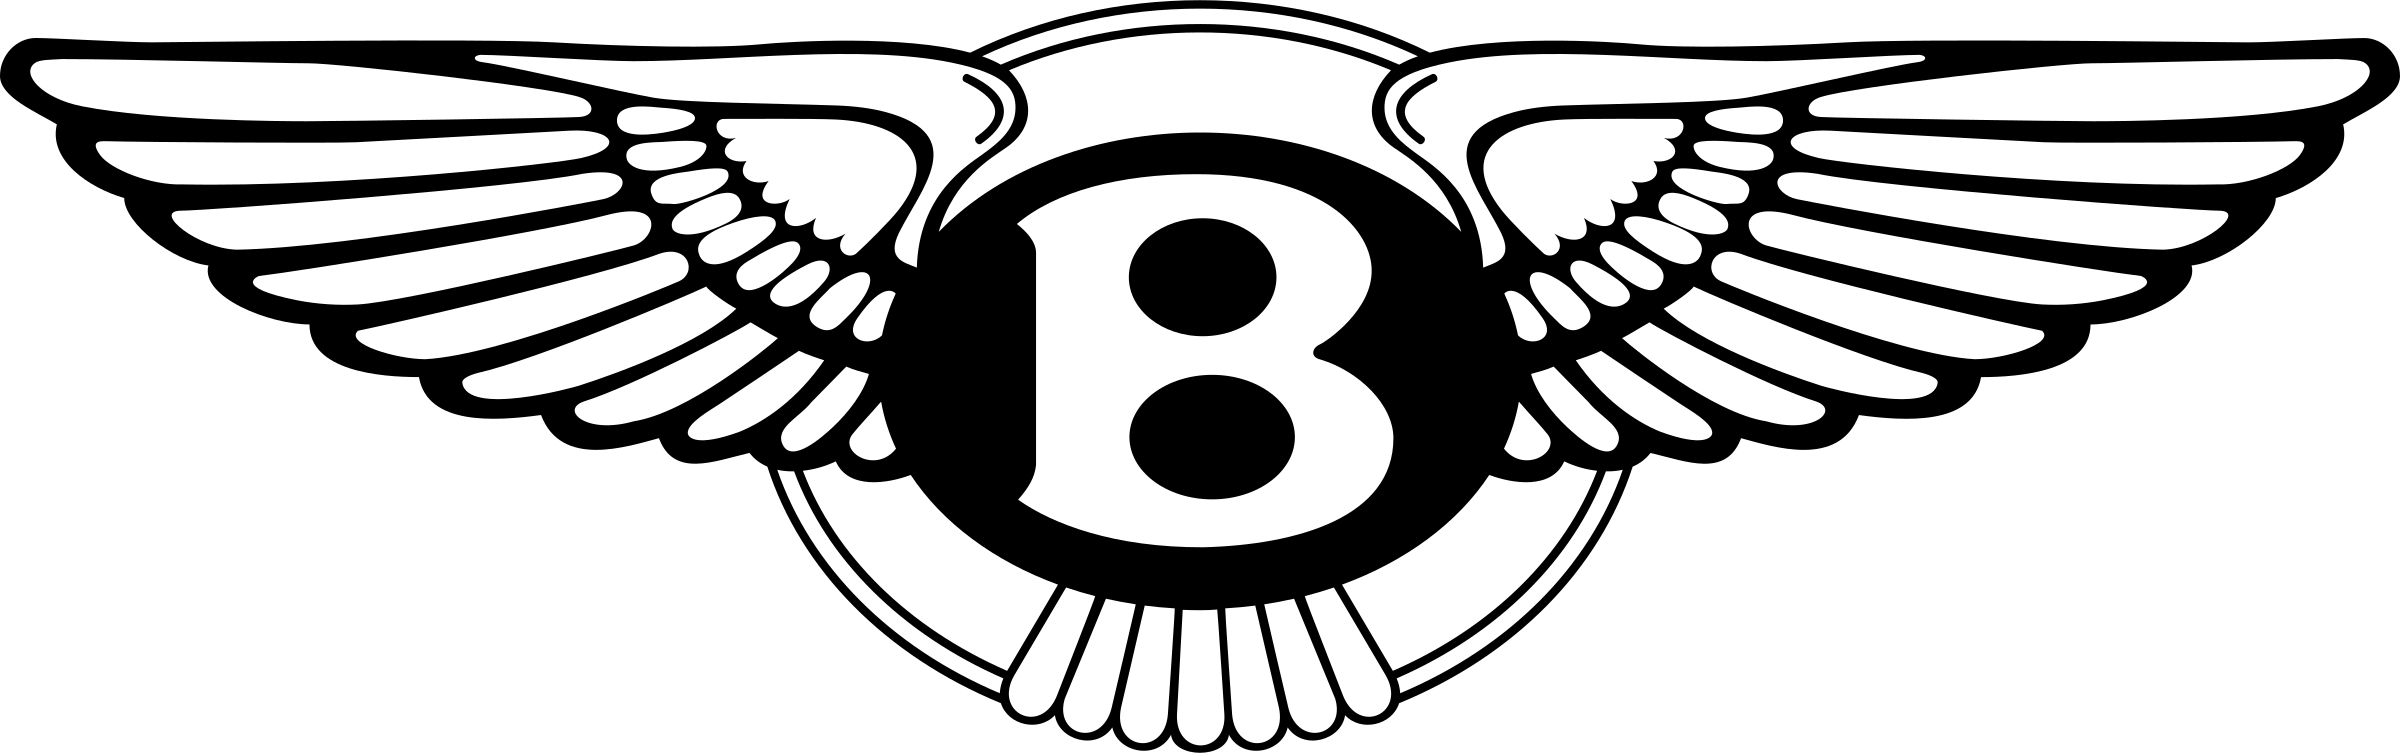 bentley-logo-png-transparent.png